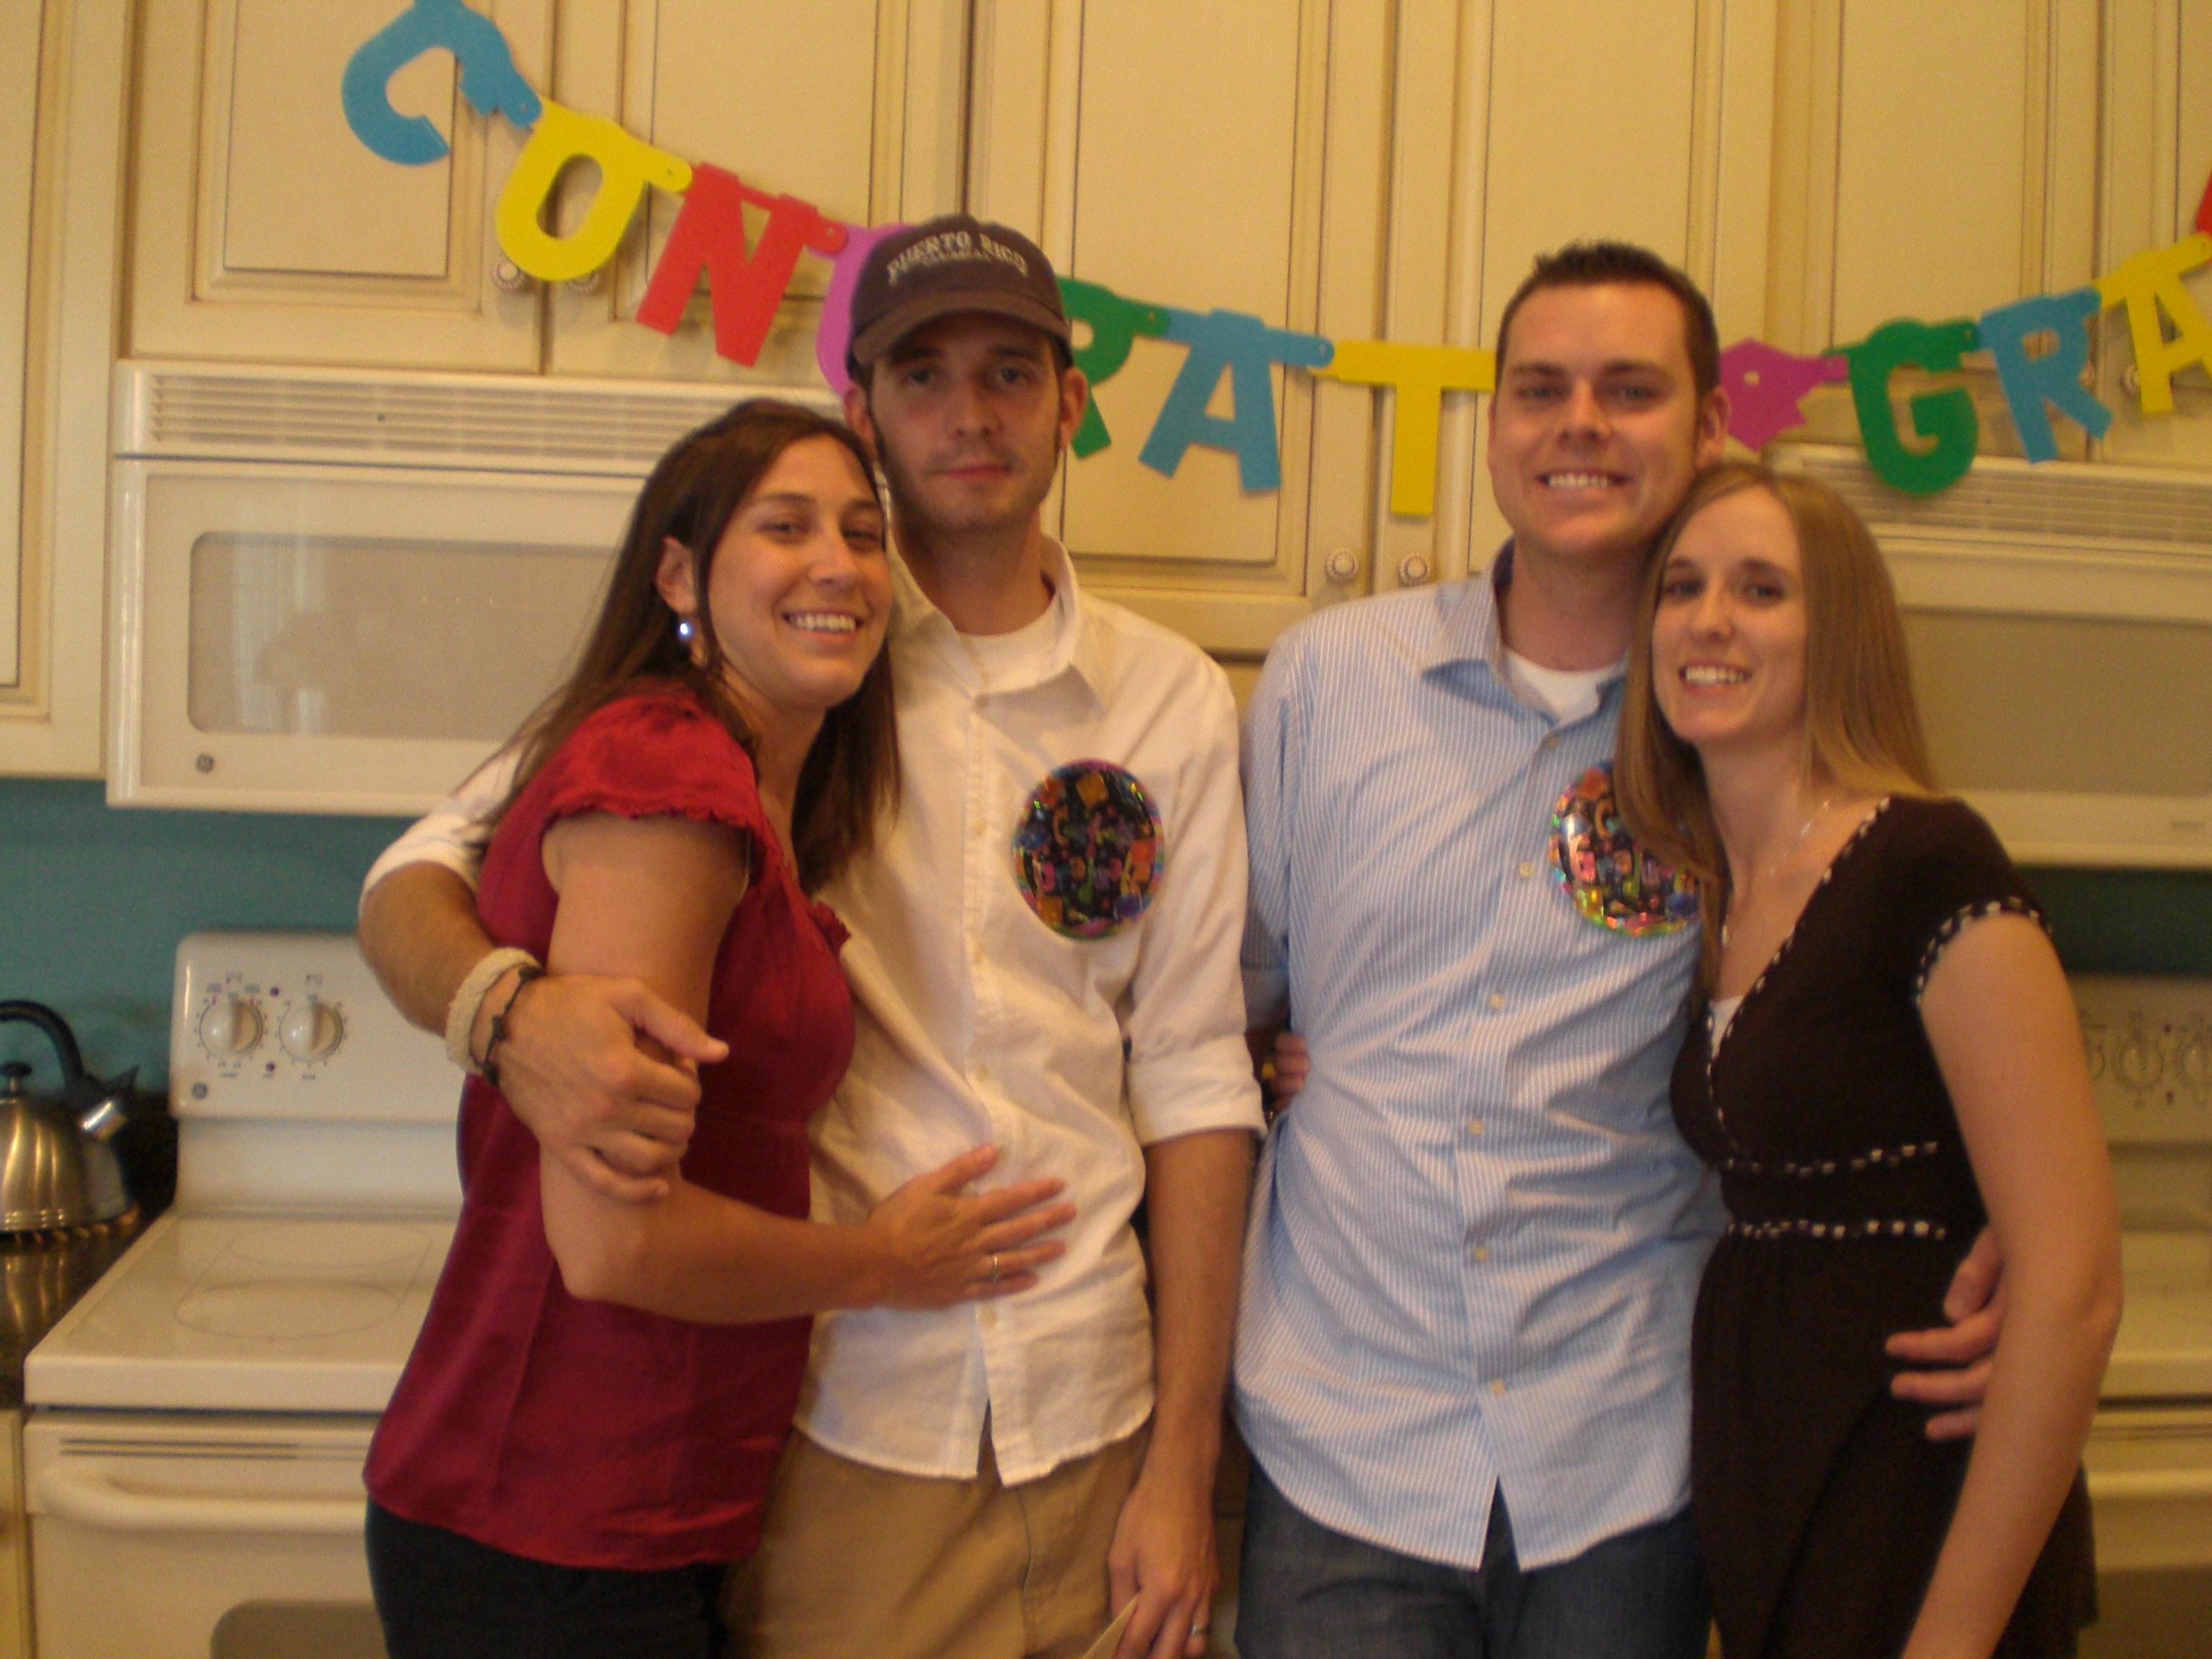 Happy Foursome